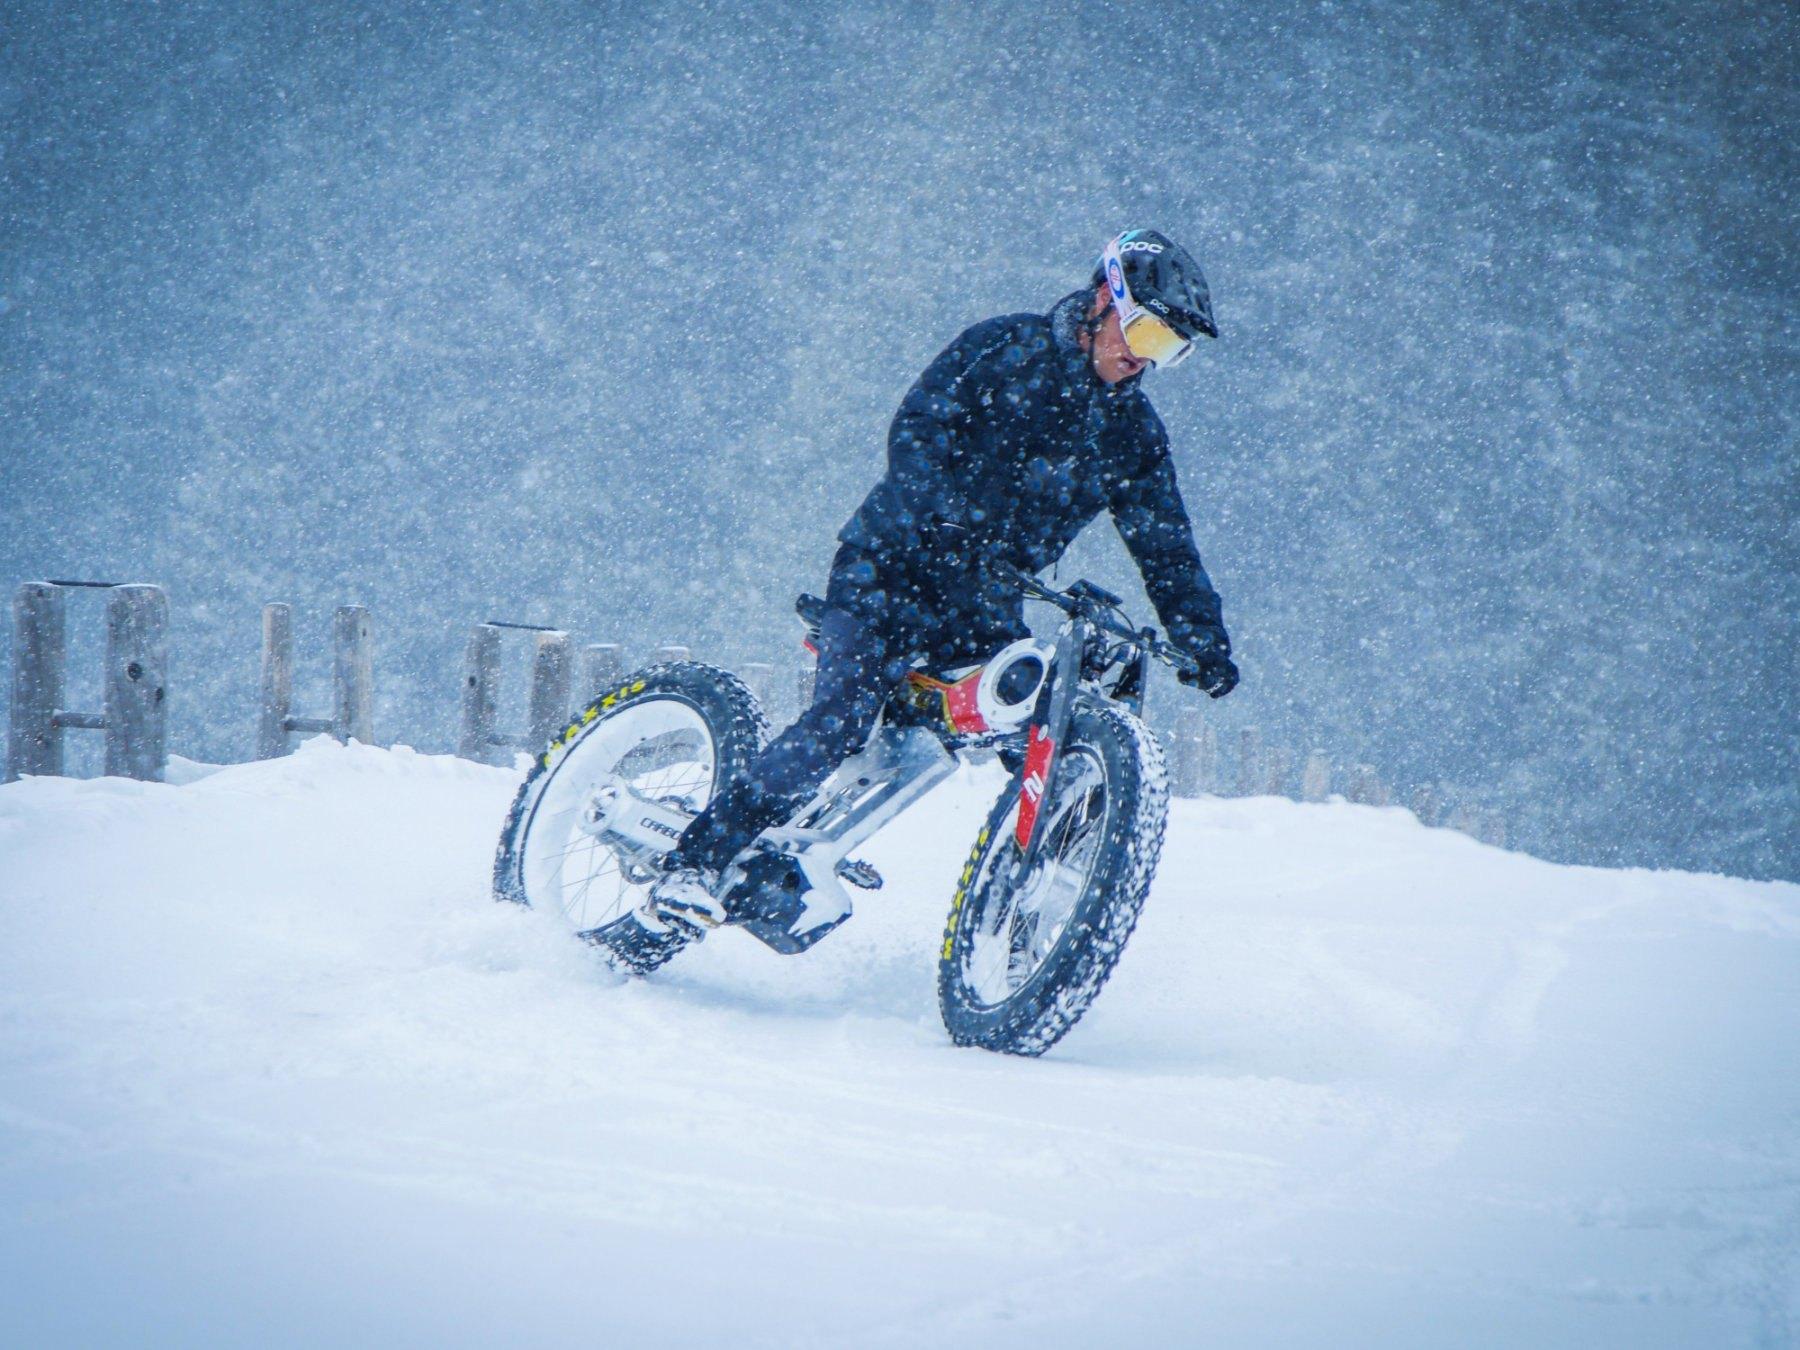 Motoparilla Slide Snow